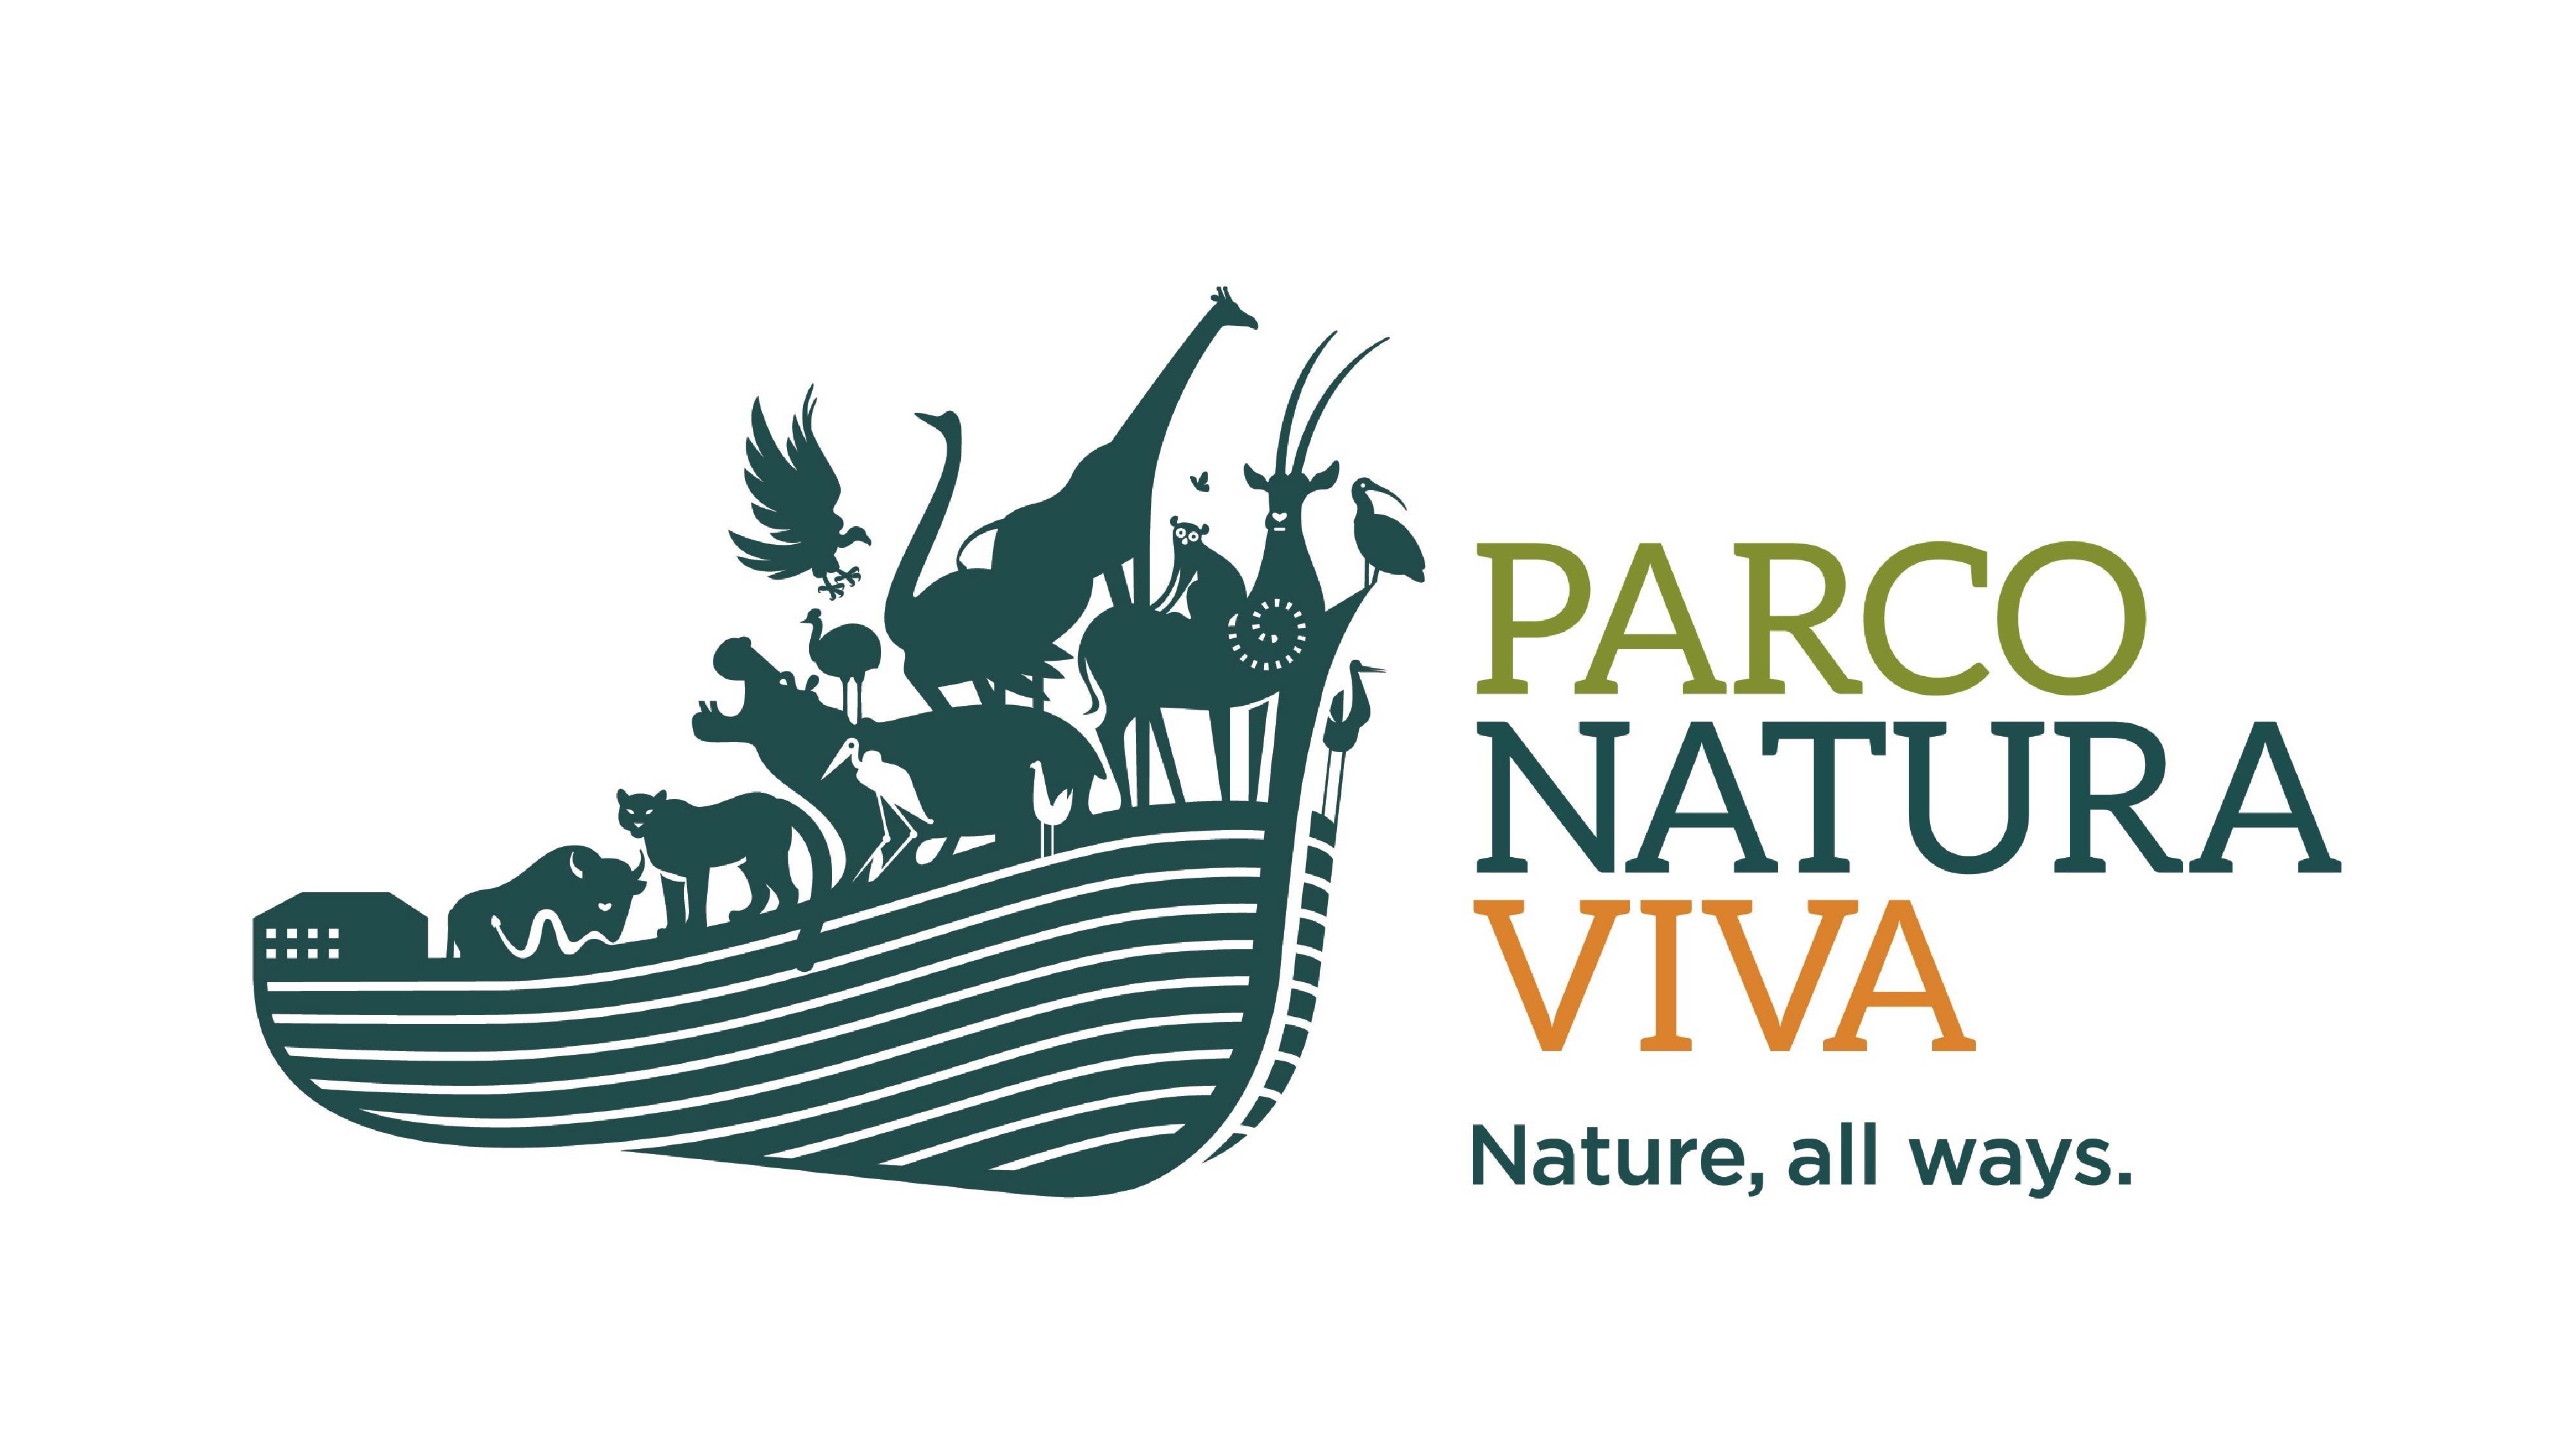 parco natura viva verona orari negozi - photo#35